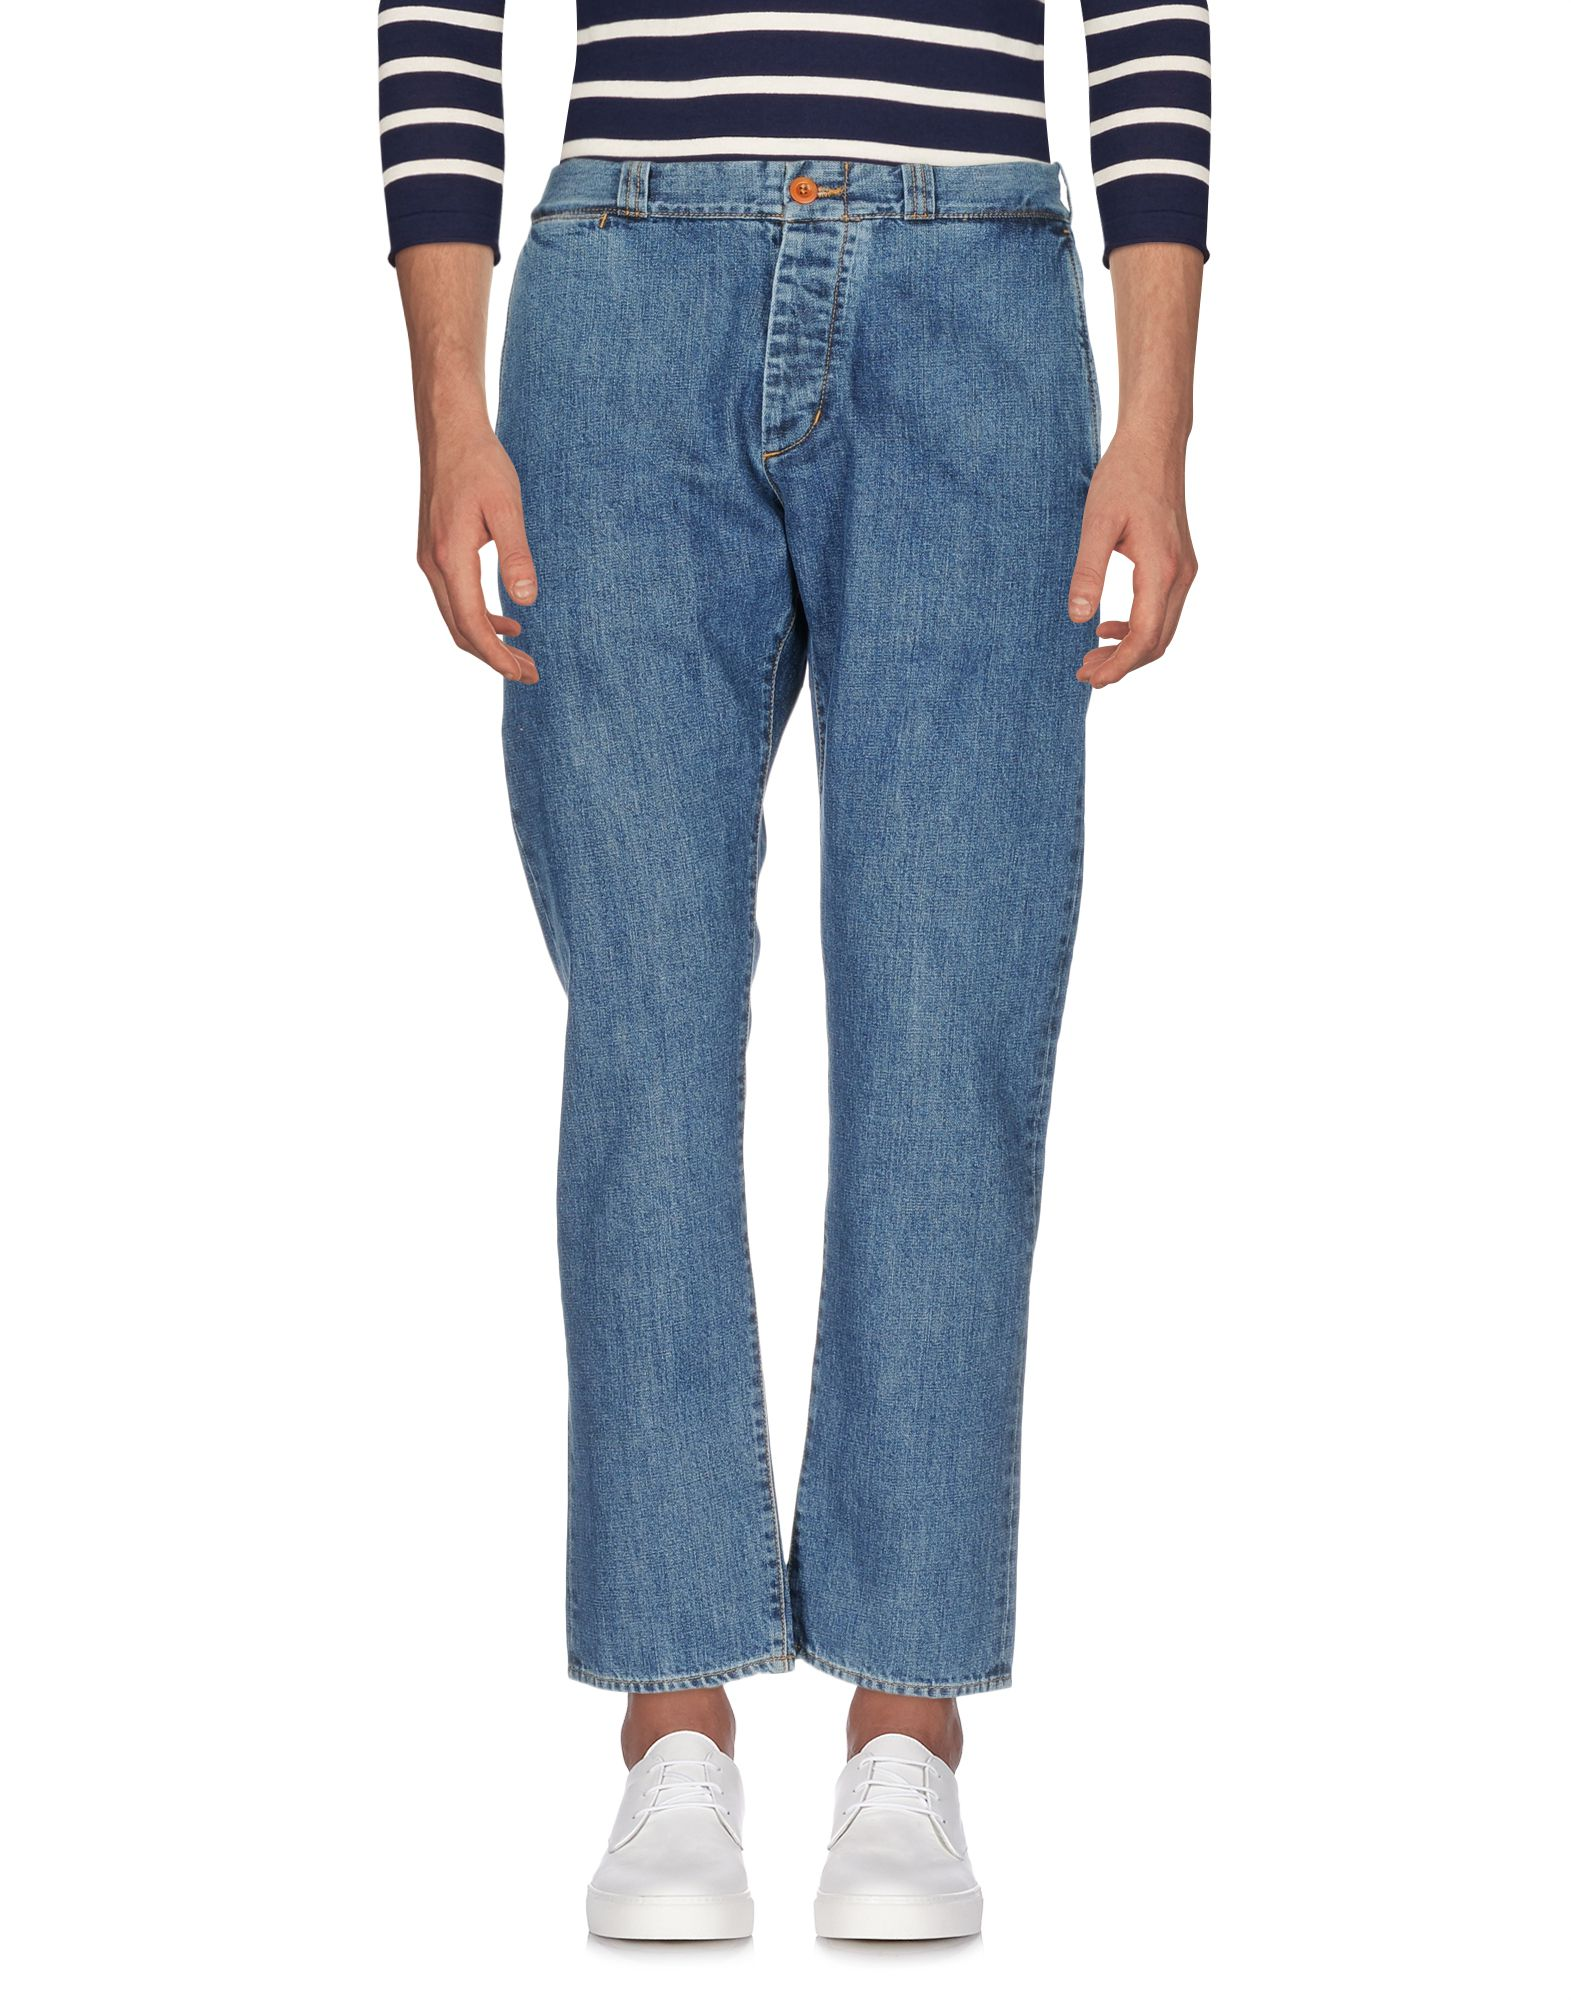 Pantaloni Jeans Bark Donna - Acquista online su